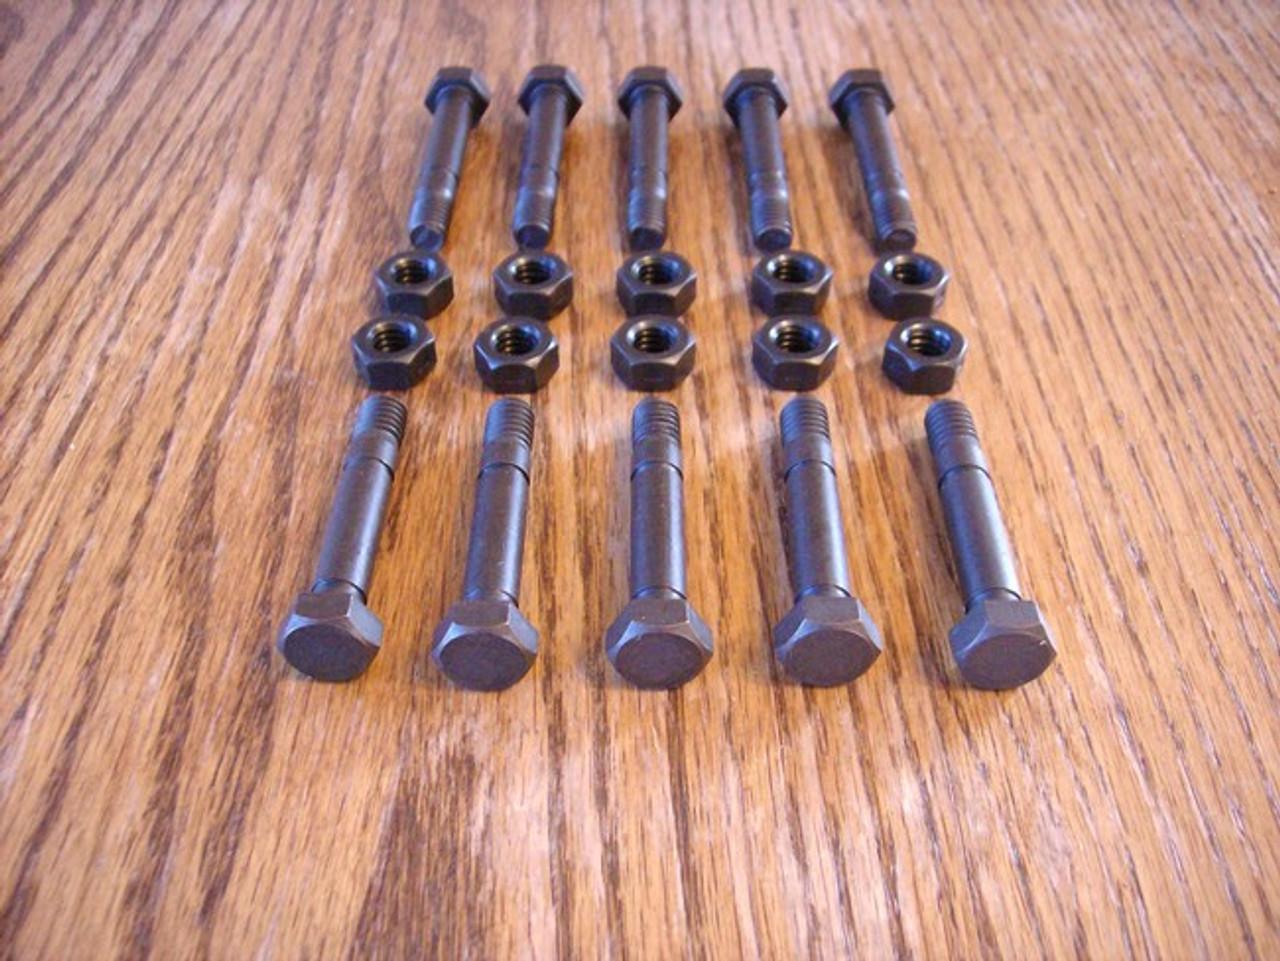 Shear Pins for Ariens ST824E, ST924DLE, ST927LE, Pro 52100100 Snowblower  bolts